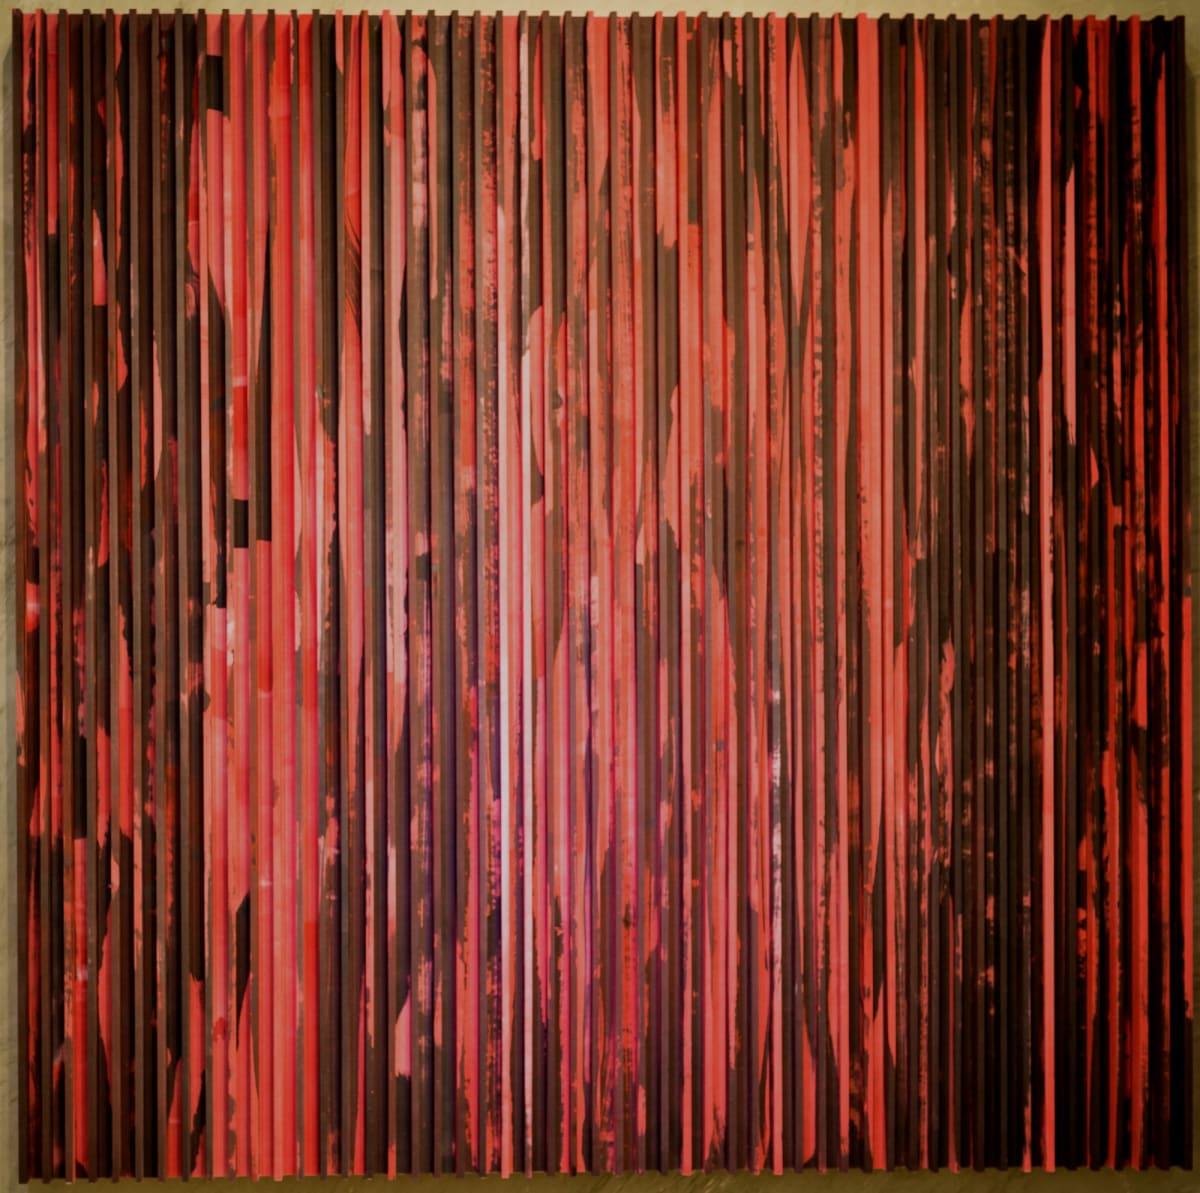 Yu Yang 于洋, Useless Brush & Ink - Red and Black 筆墨無用 - 紅與黑, 2015